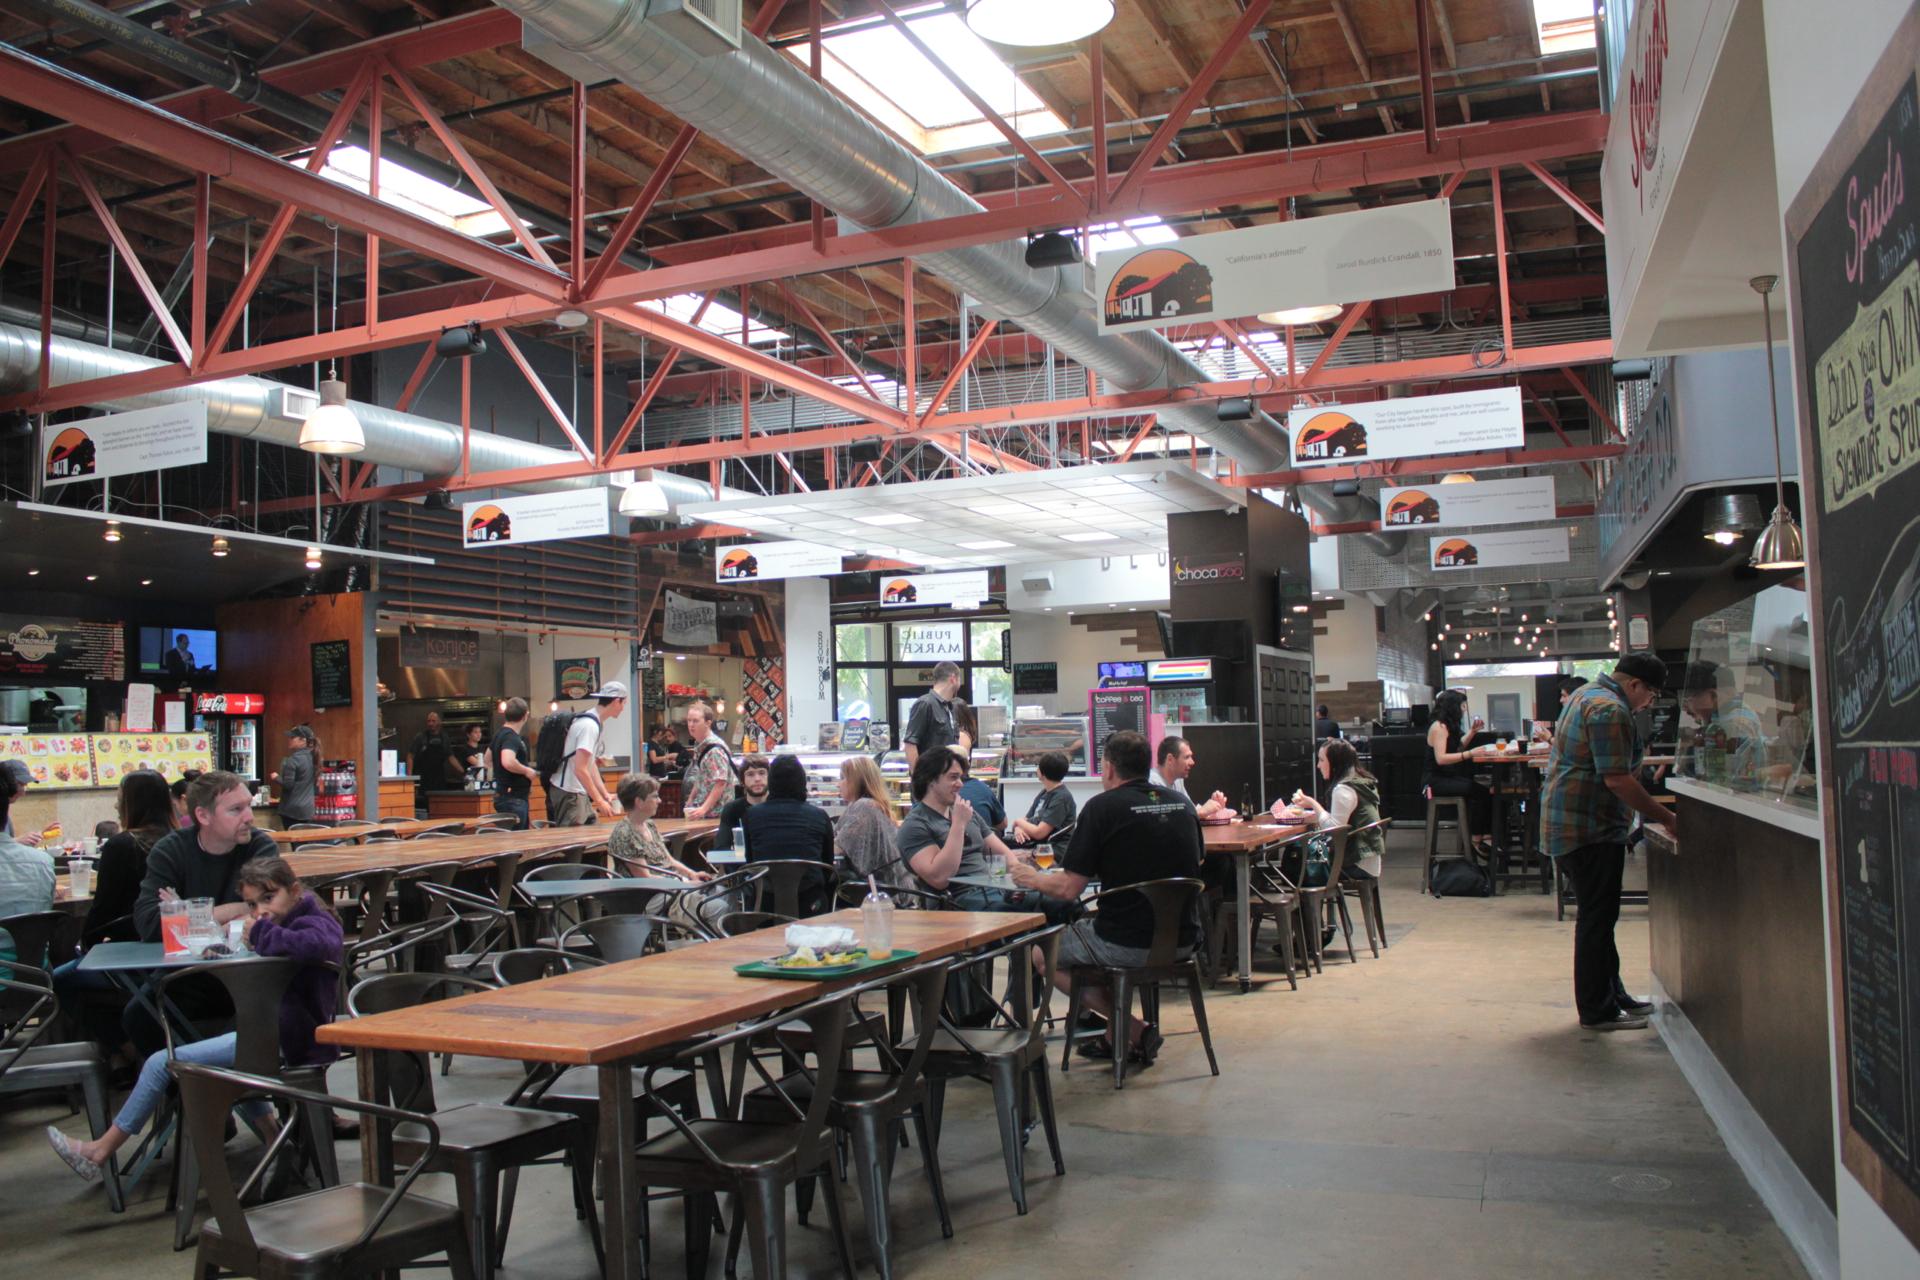 Customers Inside The San Pedro Square Market In Jose Jeff Cianci